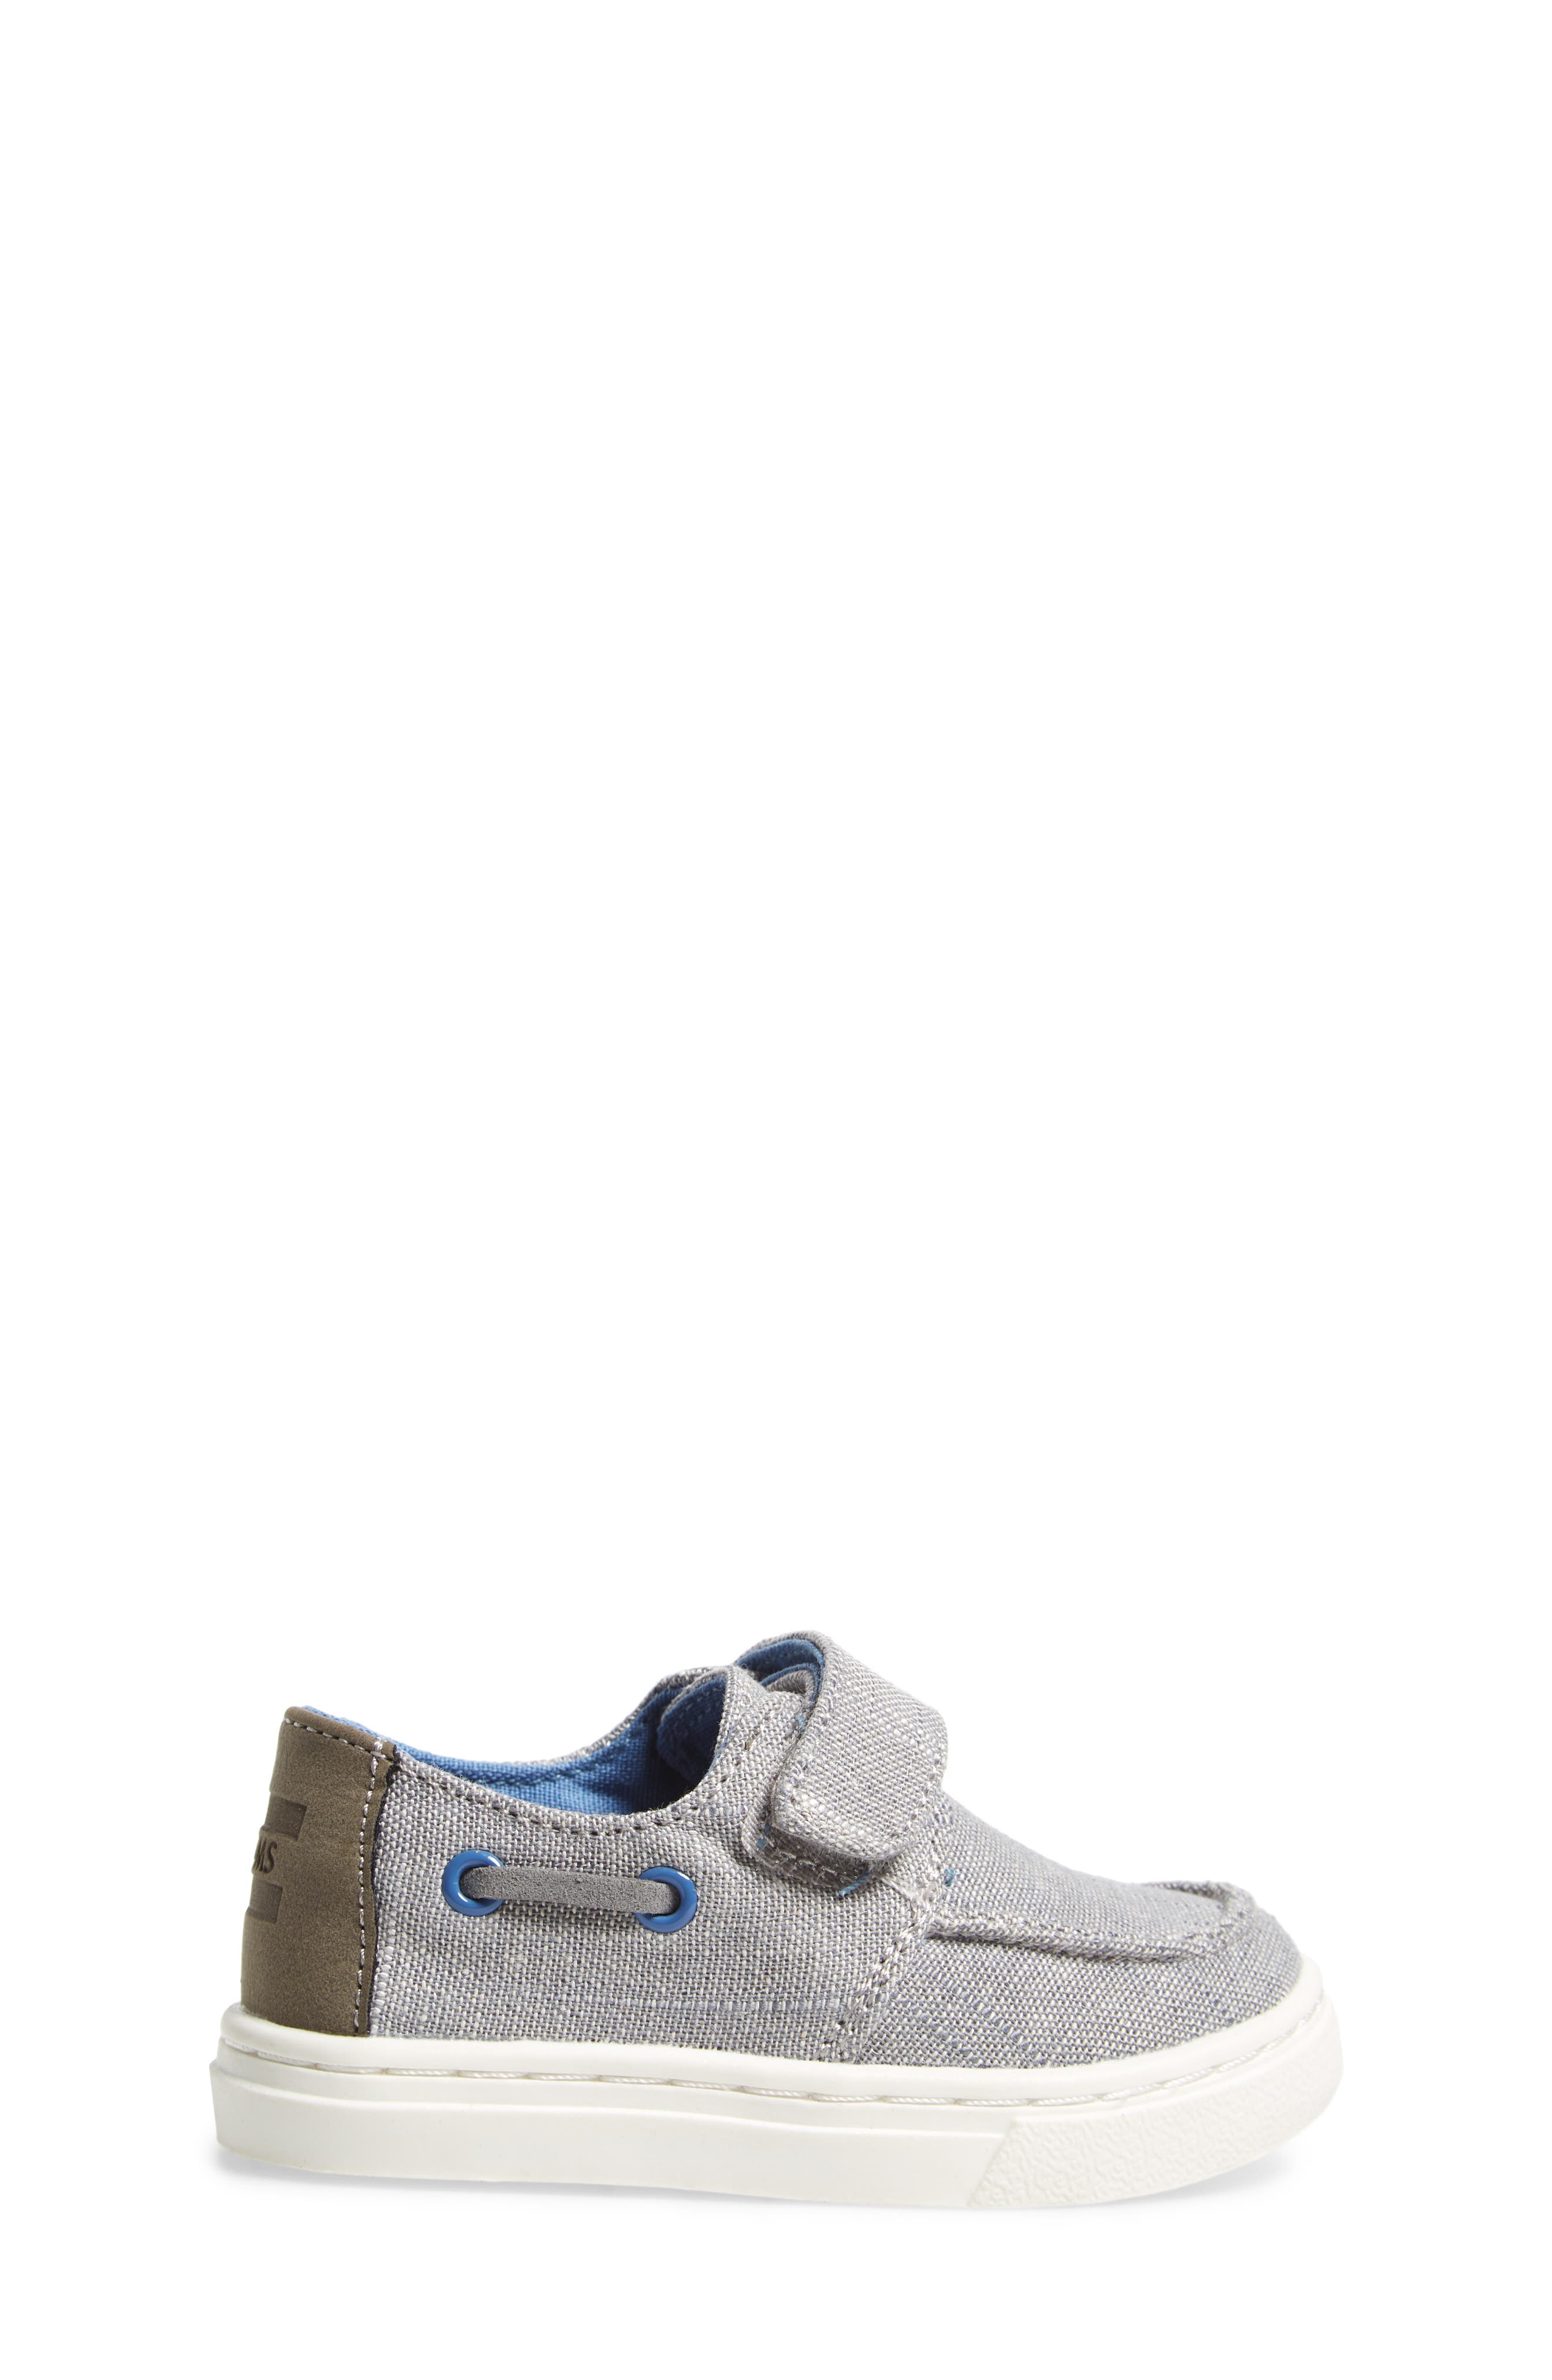 TOMS,                             Culver Boat Shoe,                             Alternate thumbnail 3, color,                             020